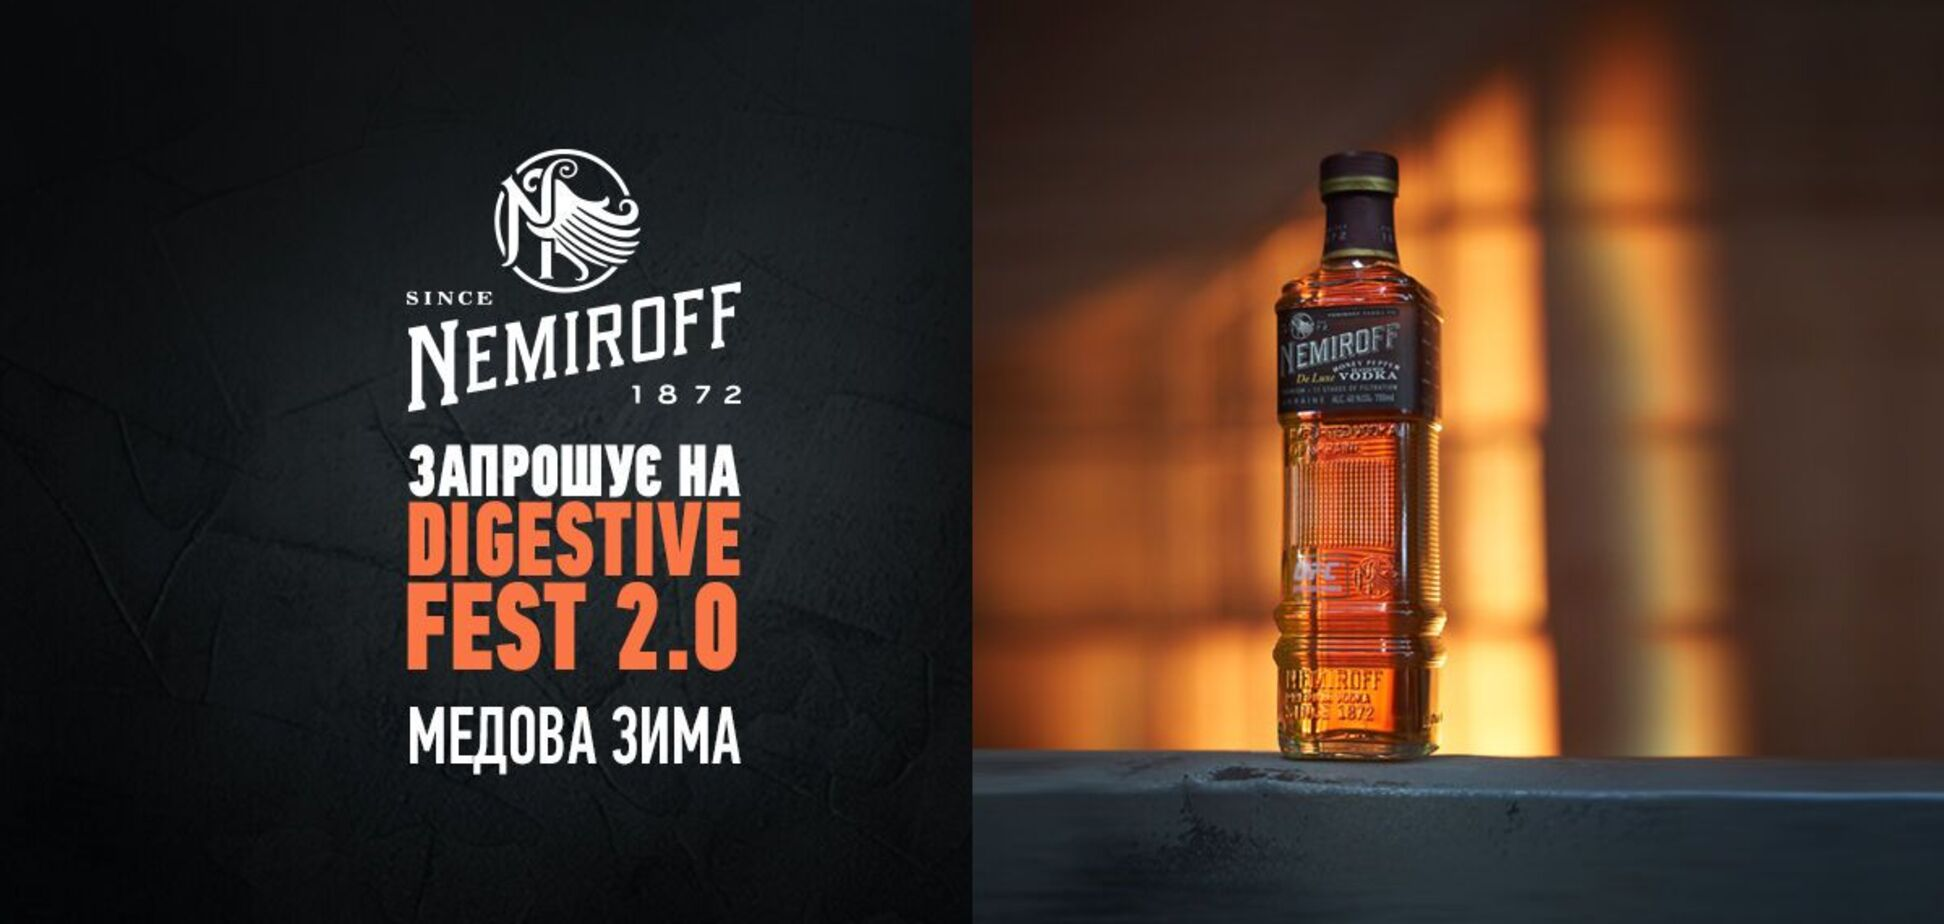 Nemiroff приглашает на Digestive Fest 2.0!